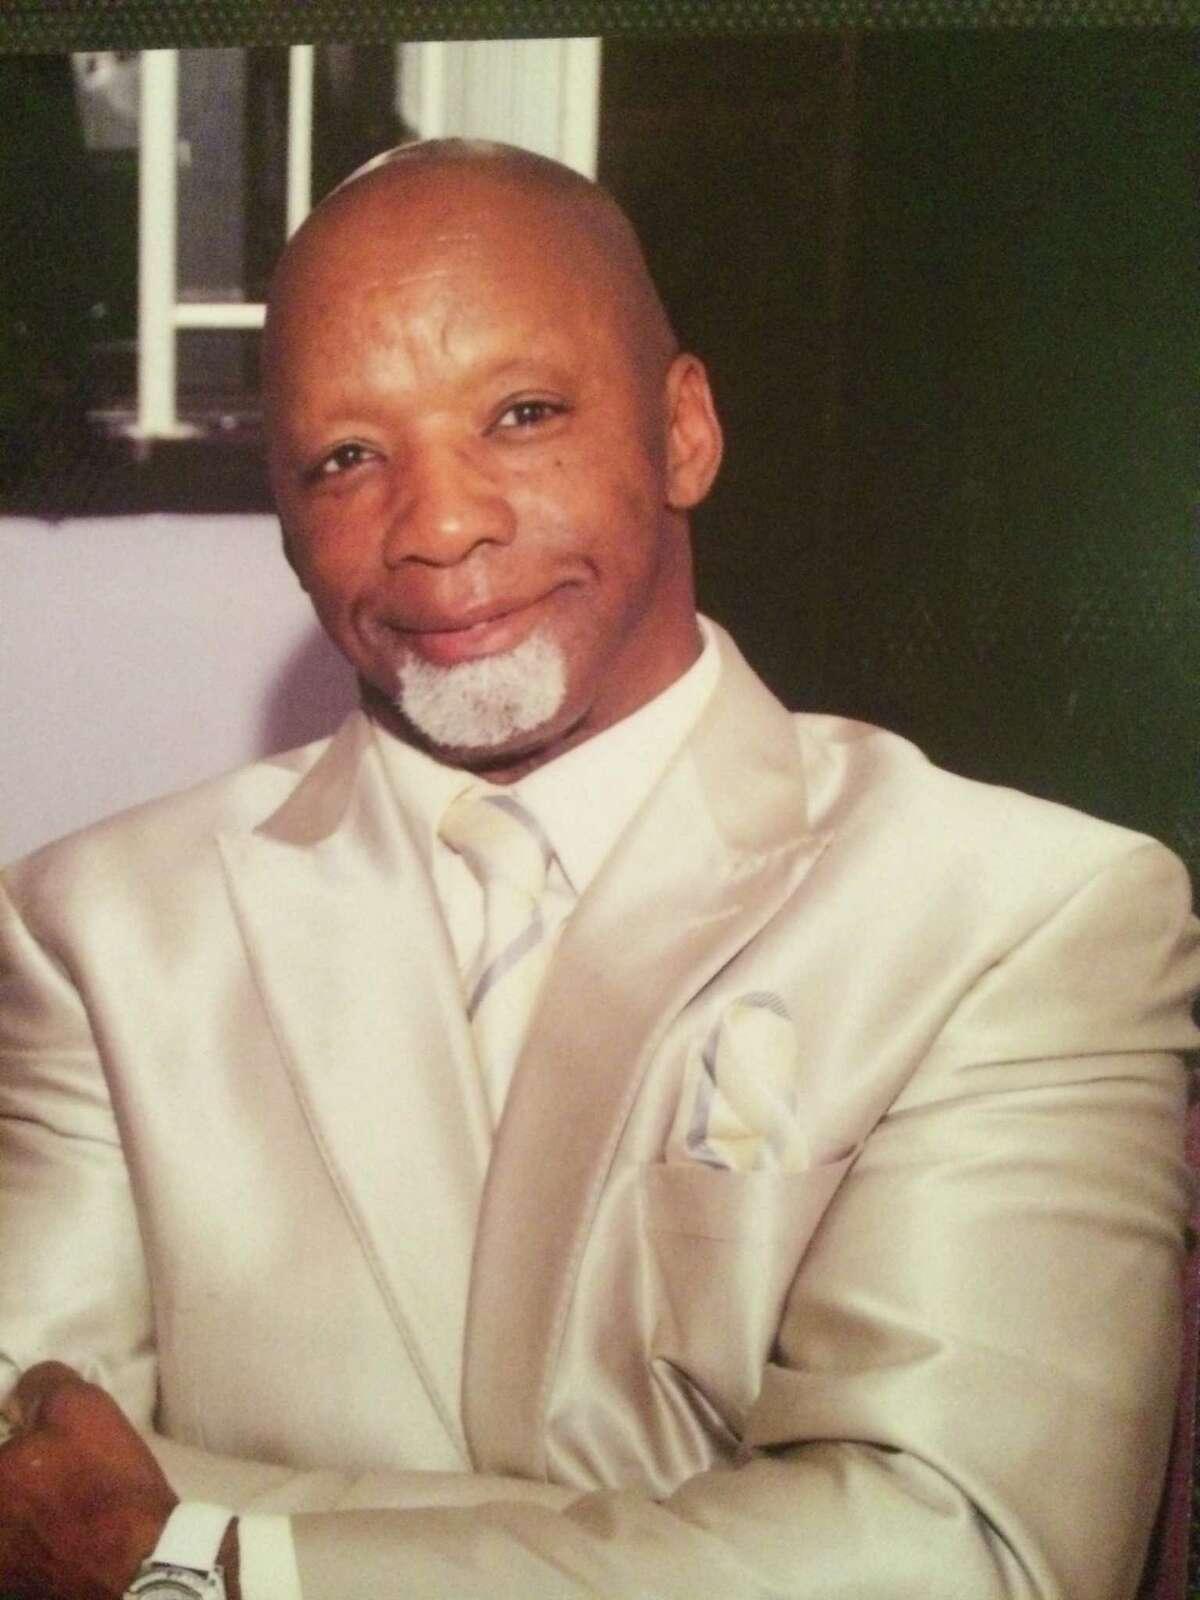 Willie Quarles, owner of Bridgport's Four Star Moving.